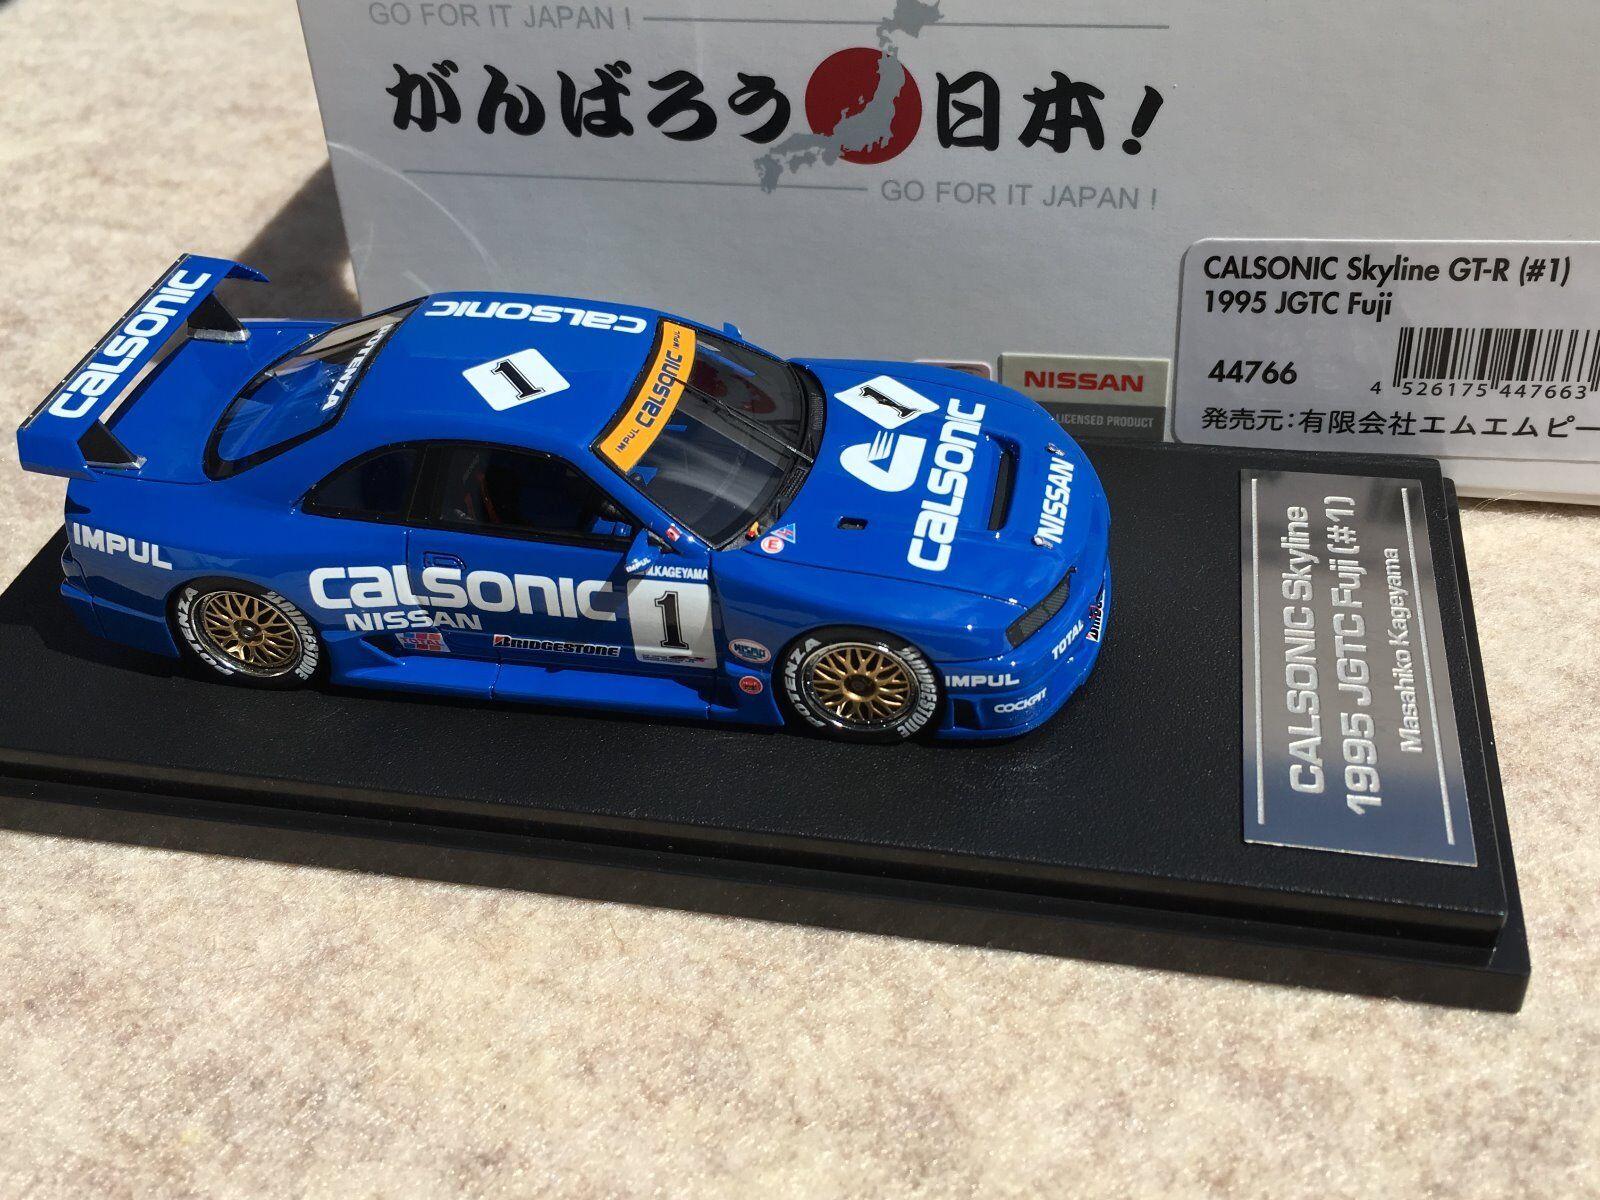 Calsonic Skyline GT-R  1 1995 JGTC Fuji -- Résine -- HPI  44766 - 1 43